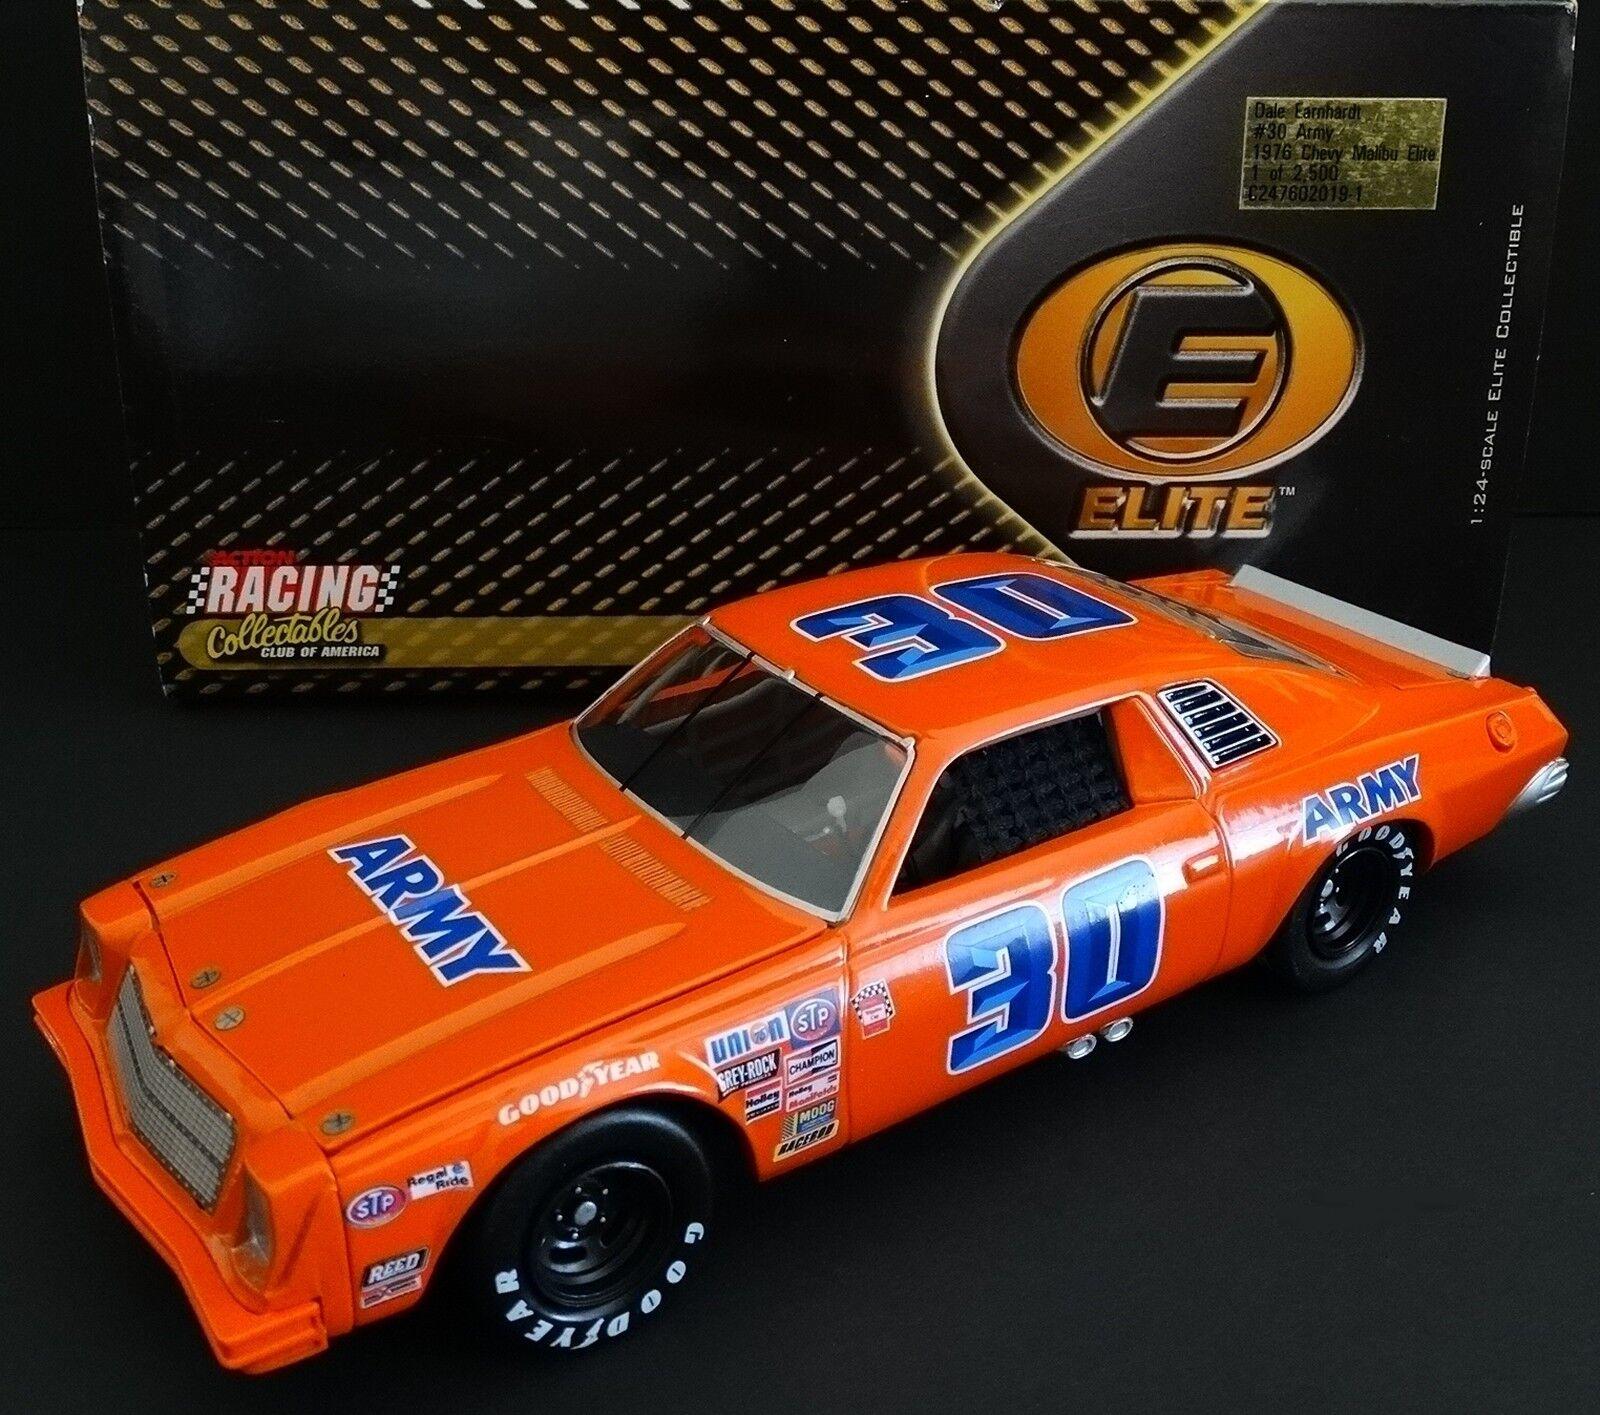 Dale Earnhardt, Sr.  30 Esercito 1/24 Rcca Elite 1976 Chevrolet Malibu 555/2500